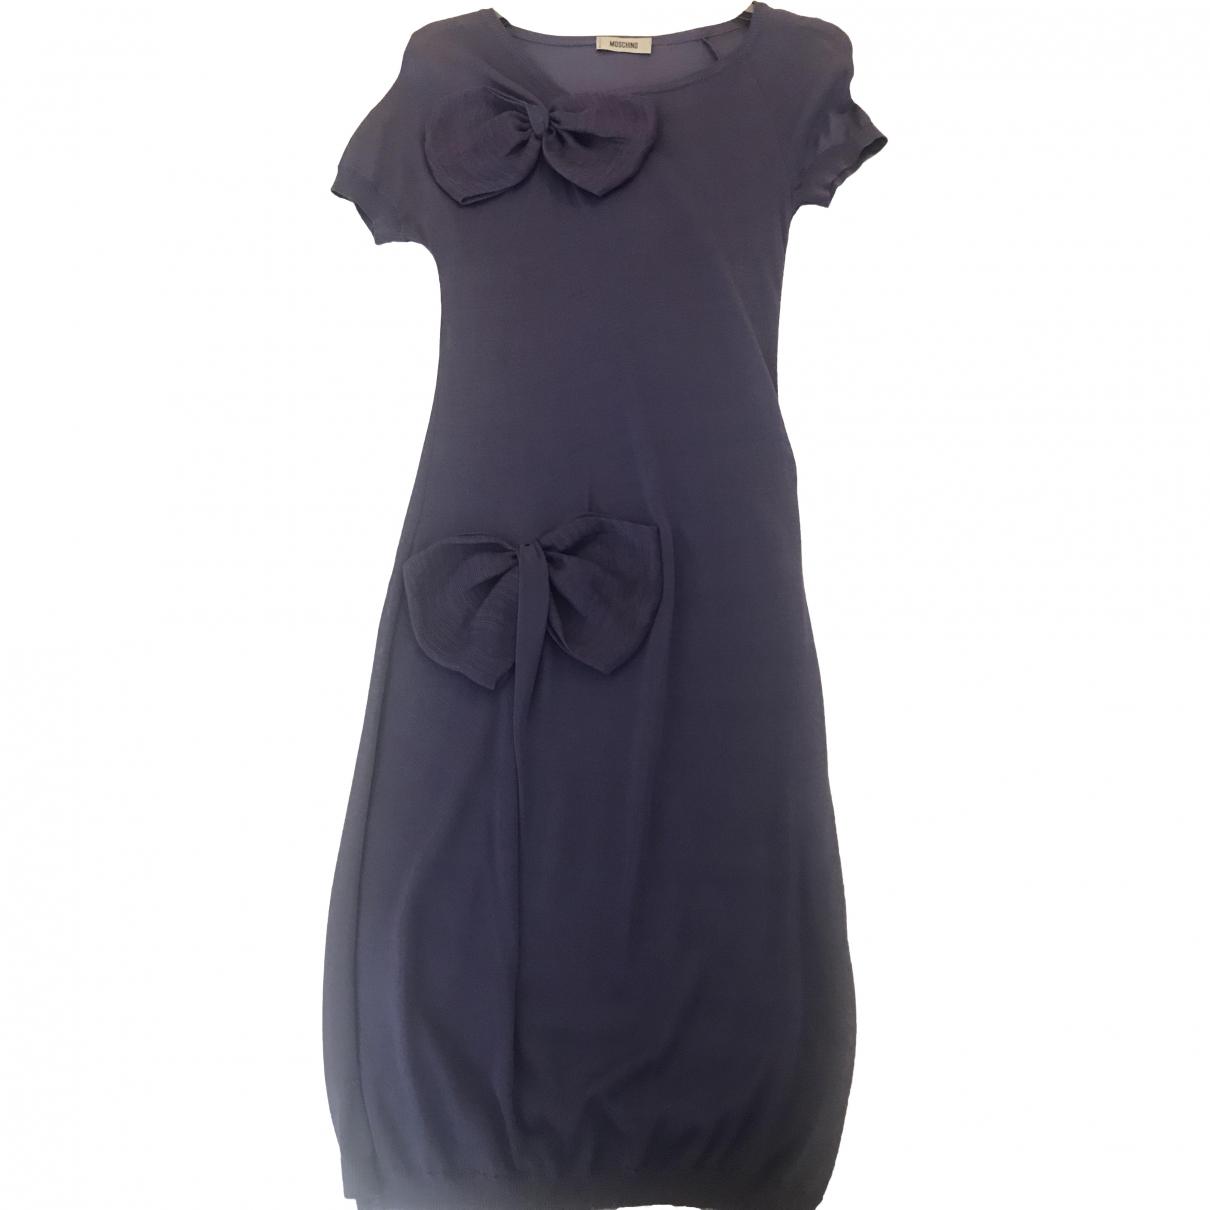 Moschino \N Purple Cotton dress for Women 38 IT